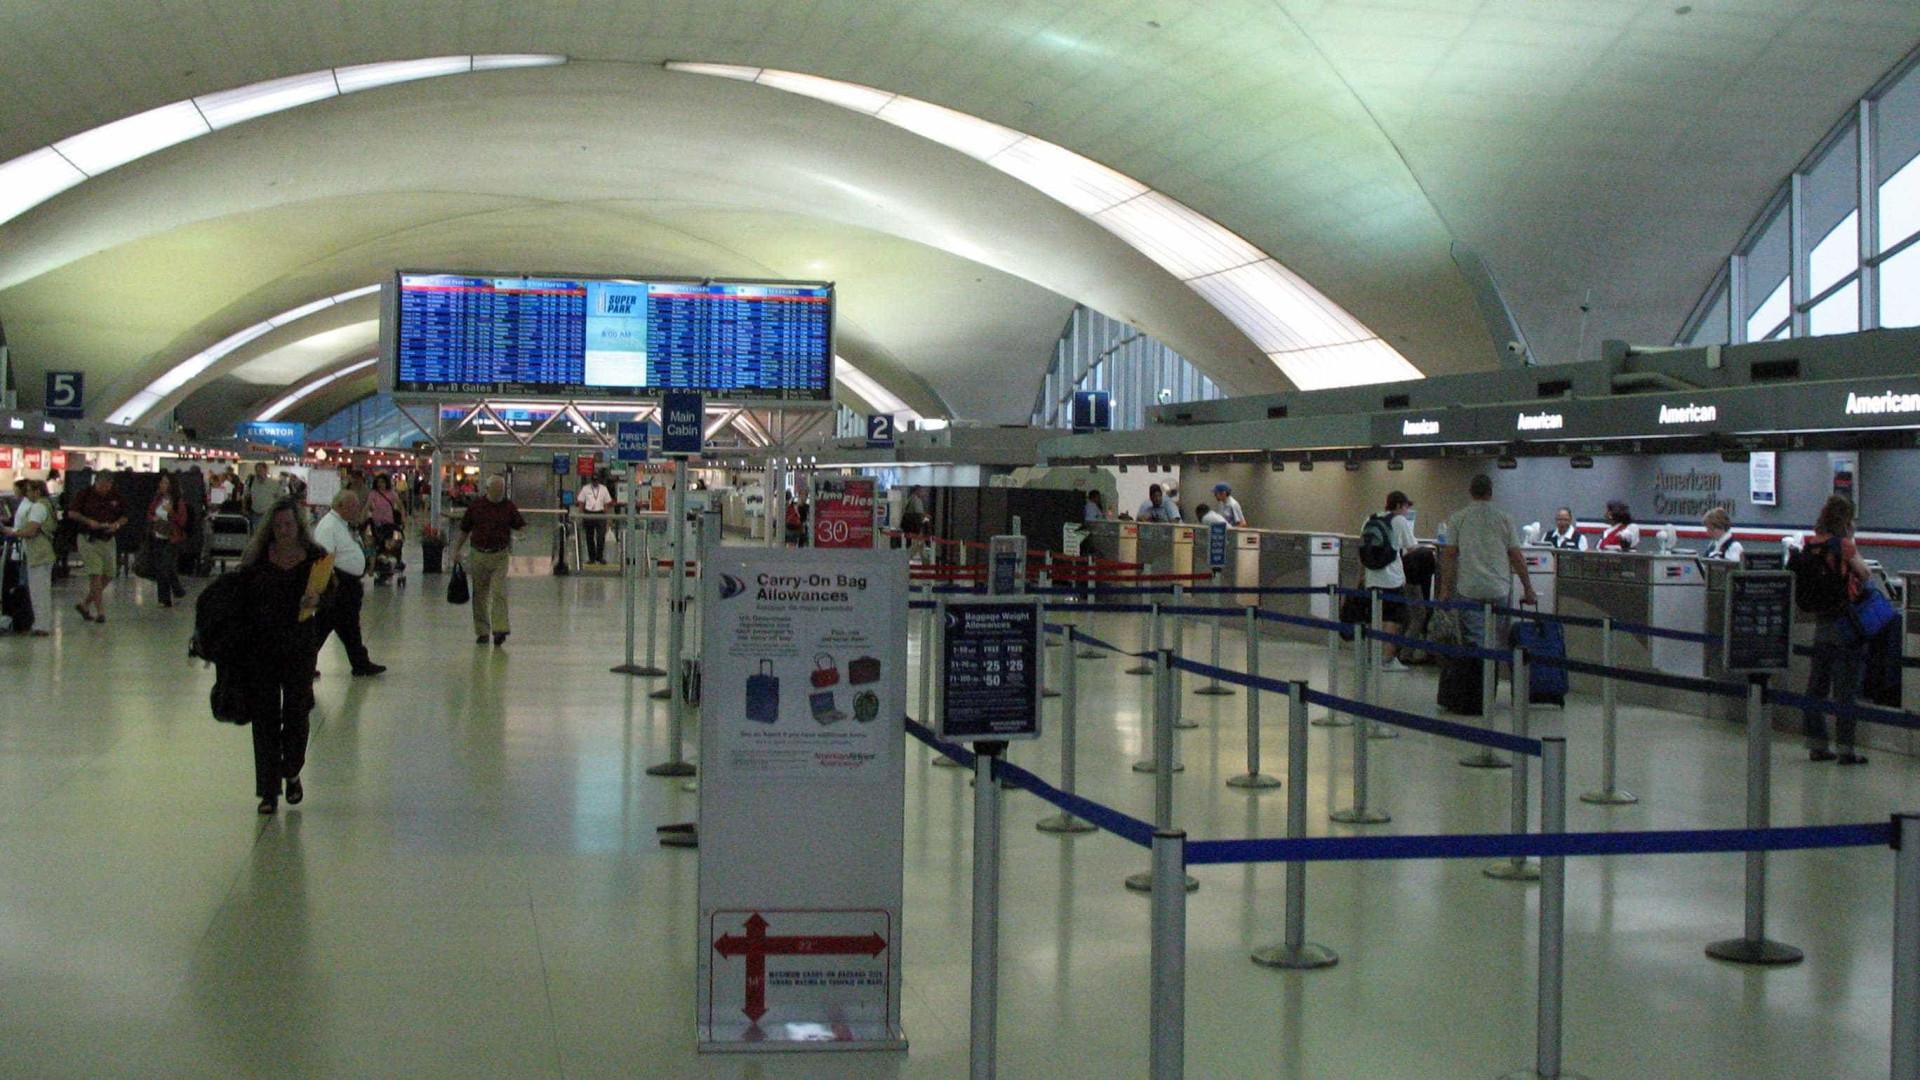 Aeroporto Internacional De Macau : Notícias ao minuto aeroporto de macau com recorde